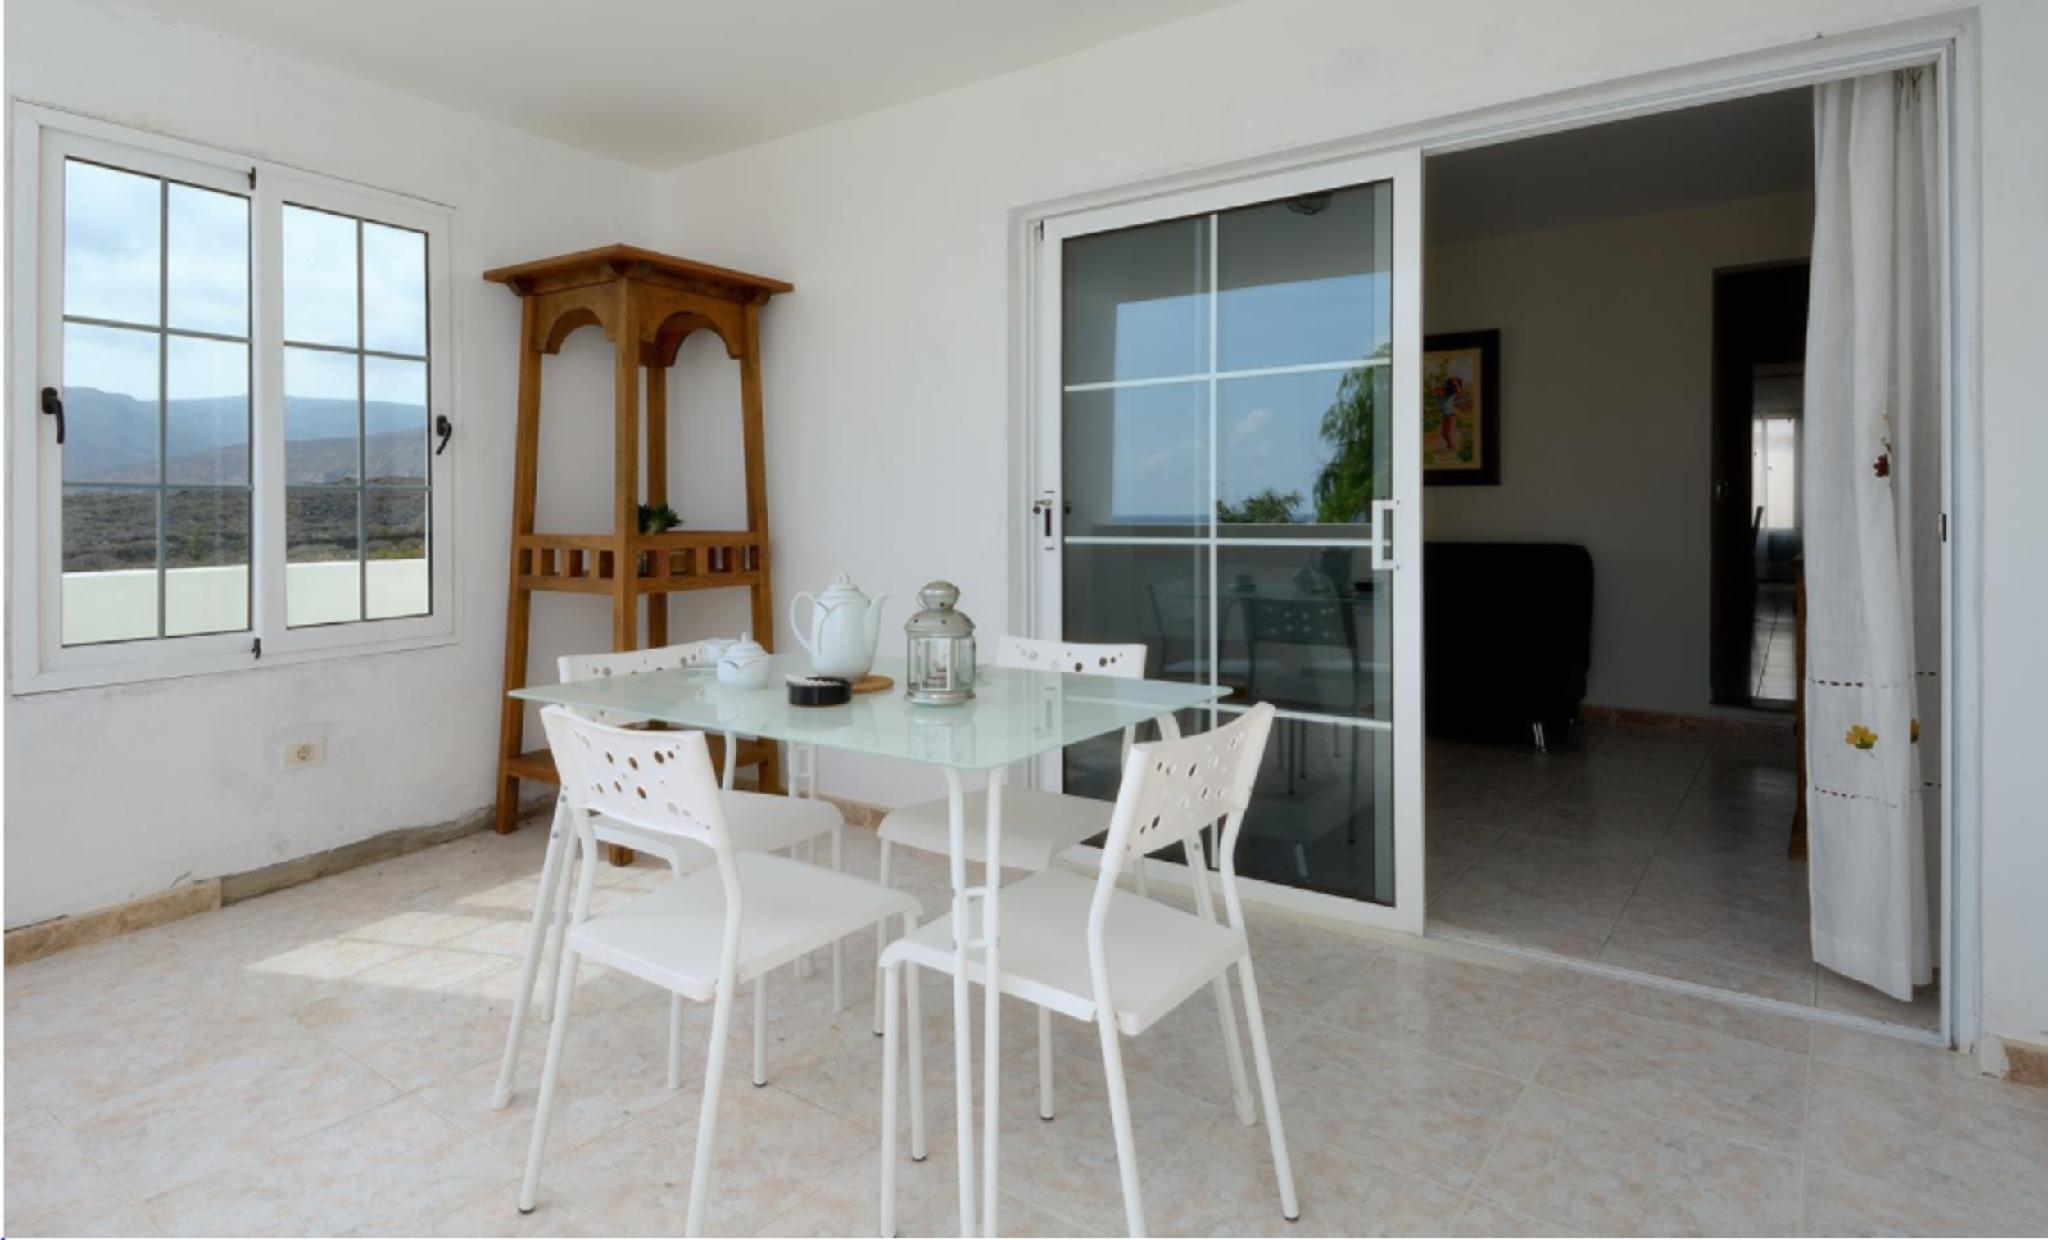 102832    Apartment In Lanzarote